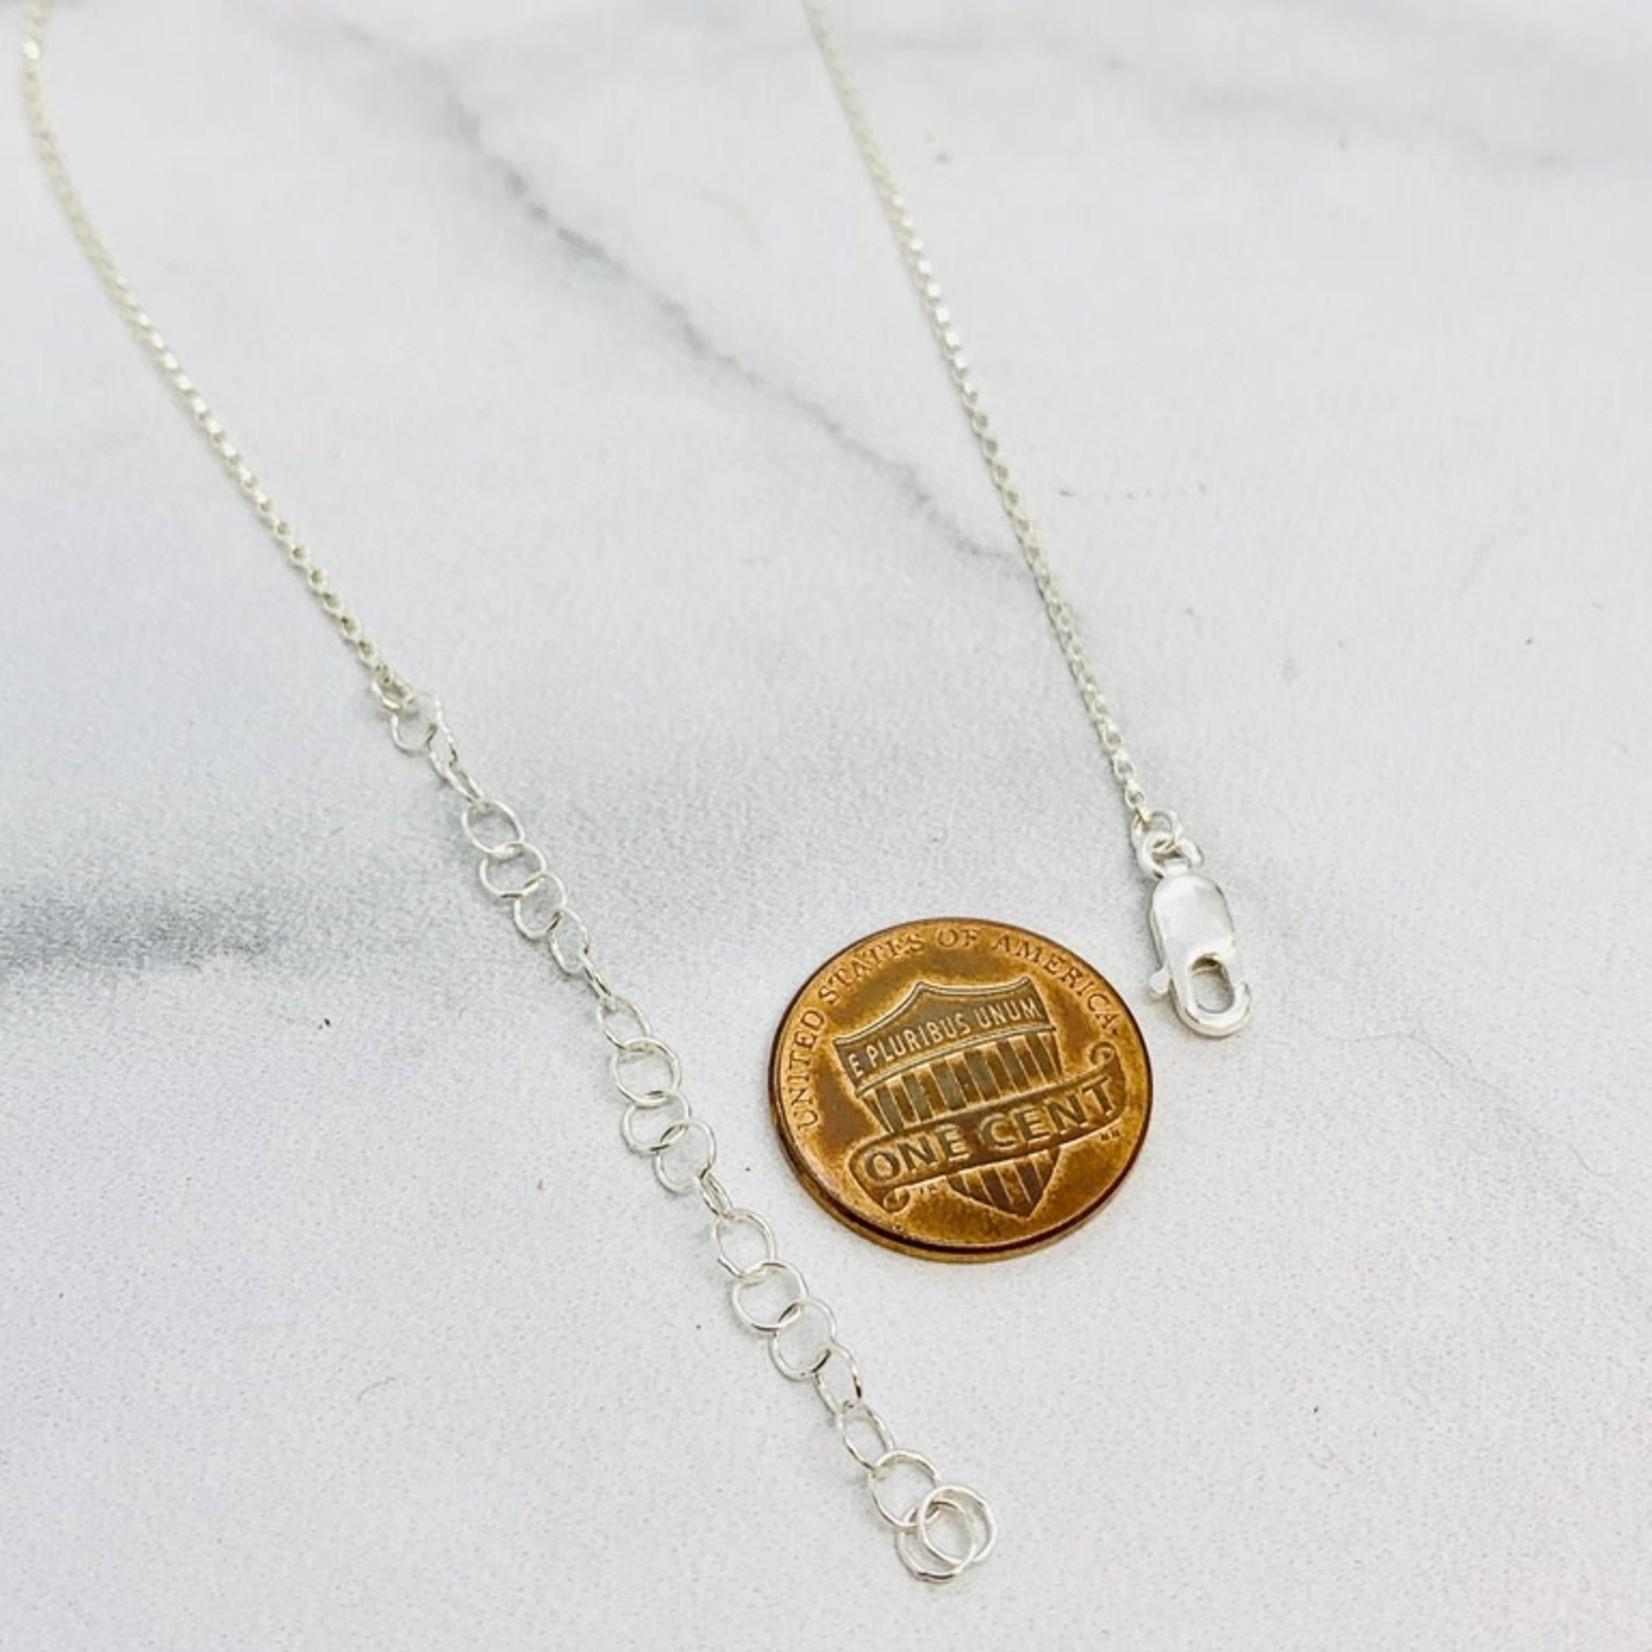 Handmade necklace with roman sea glass disc dangle